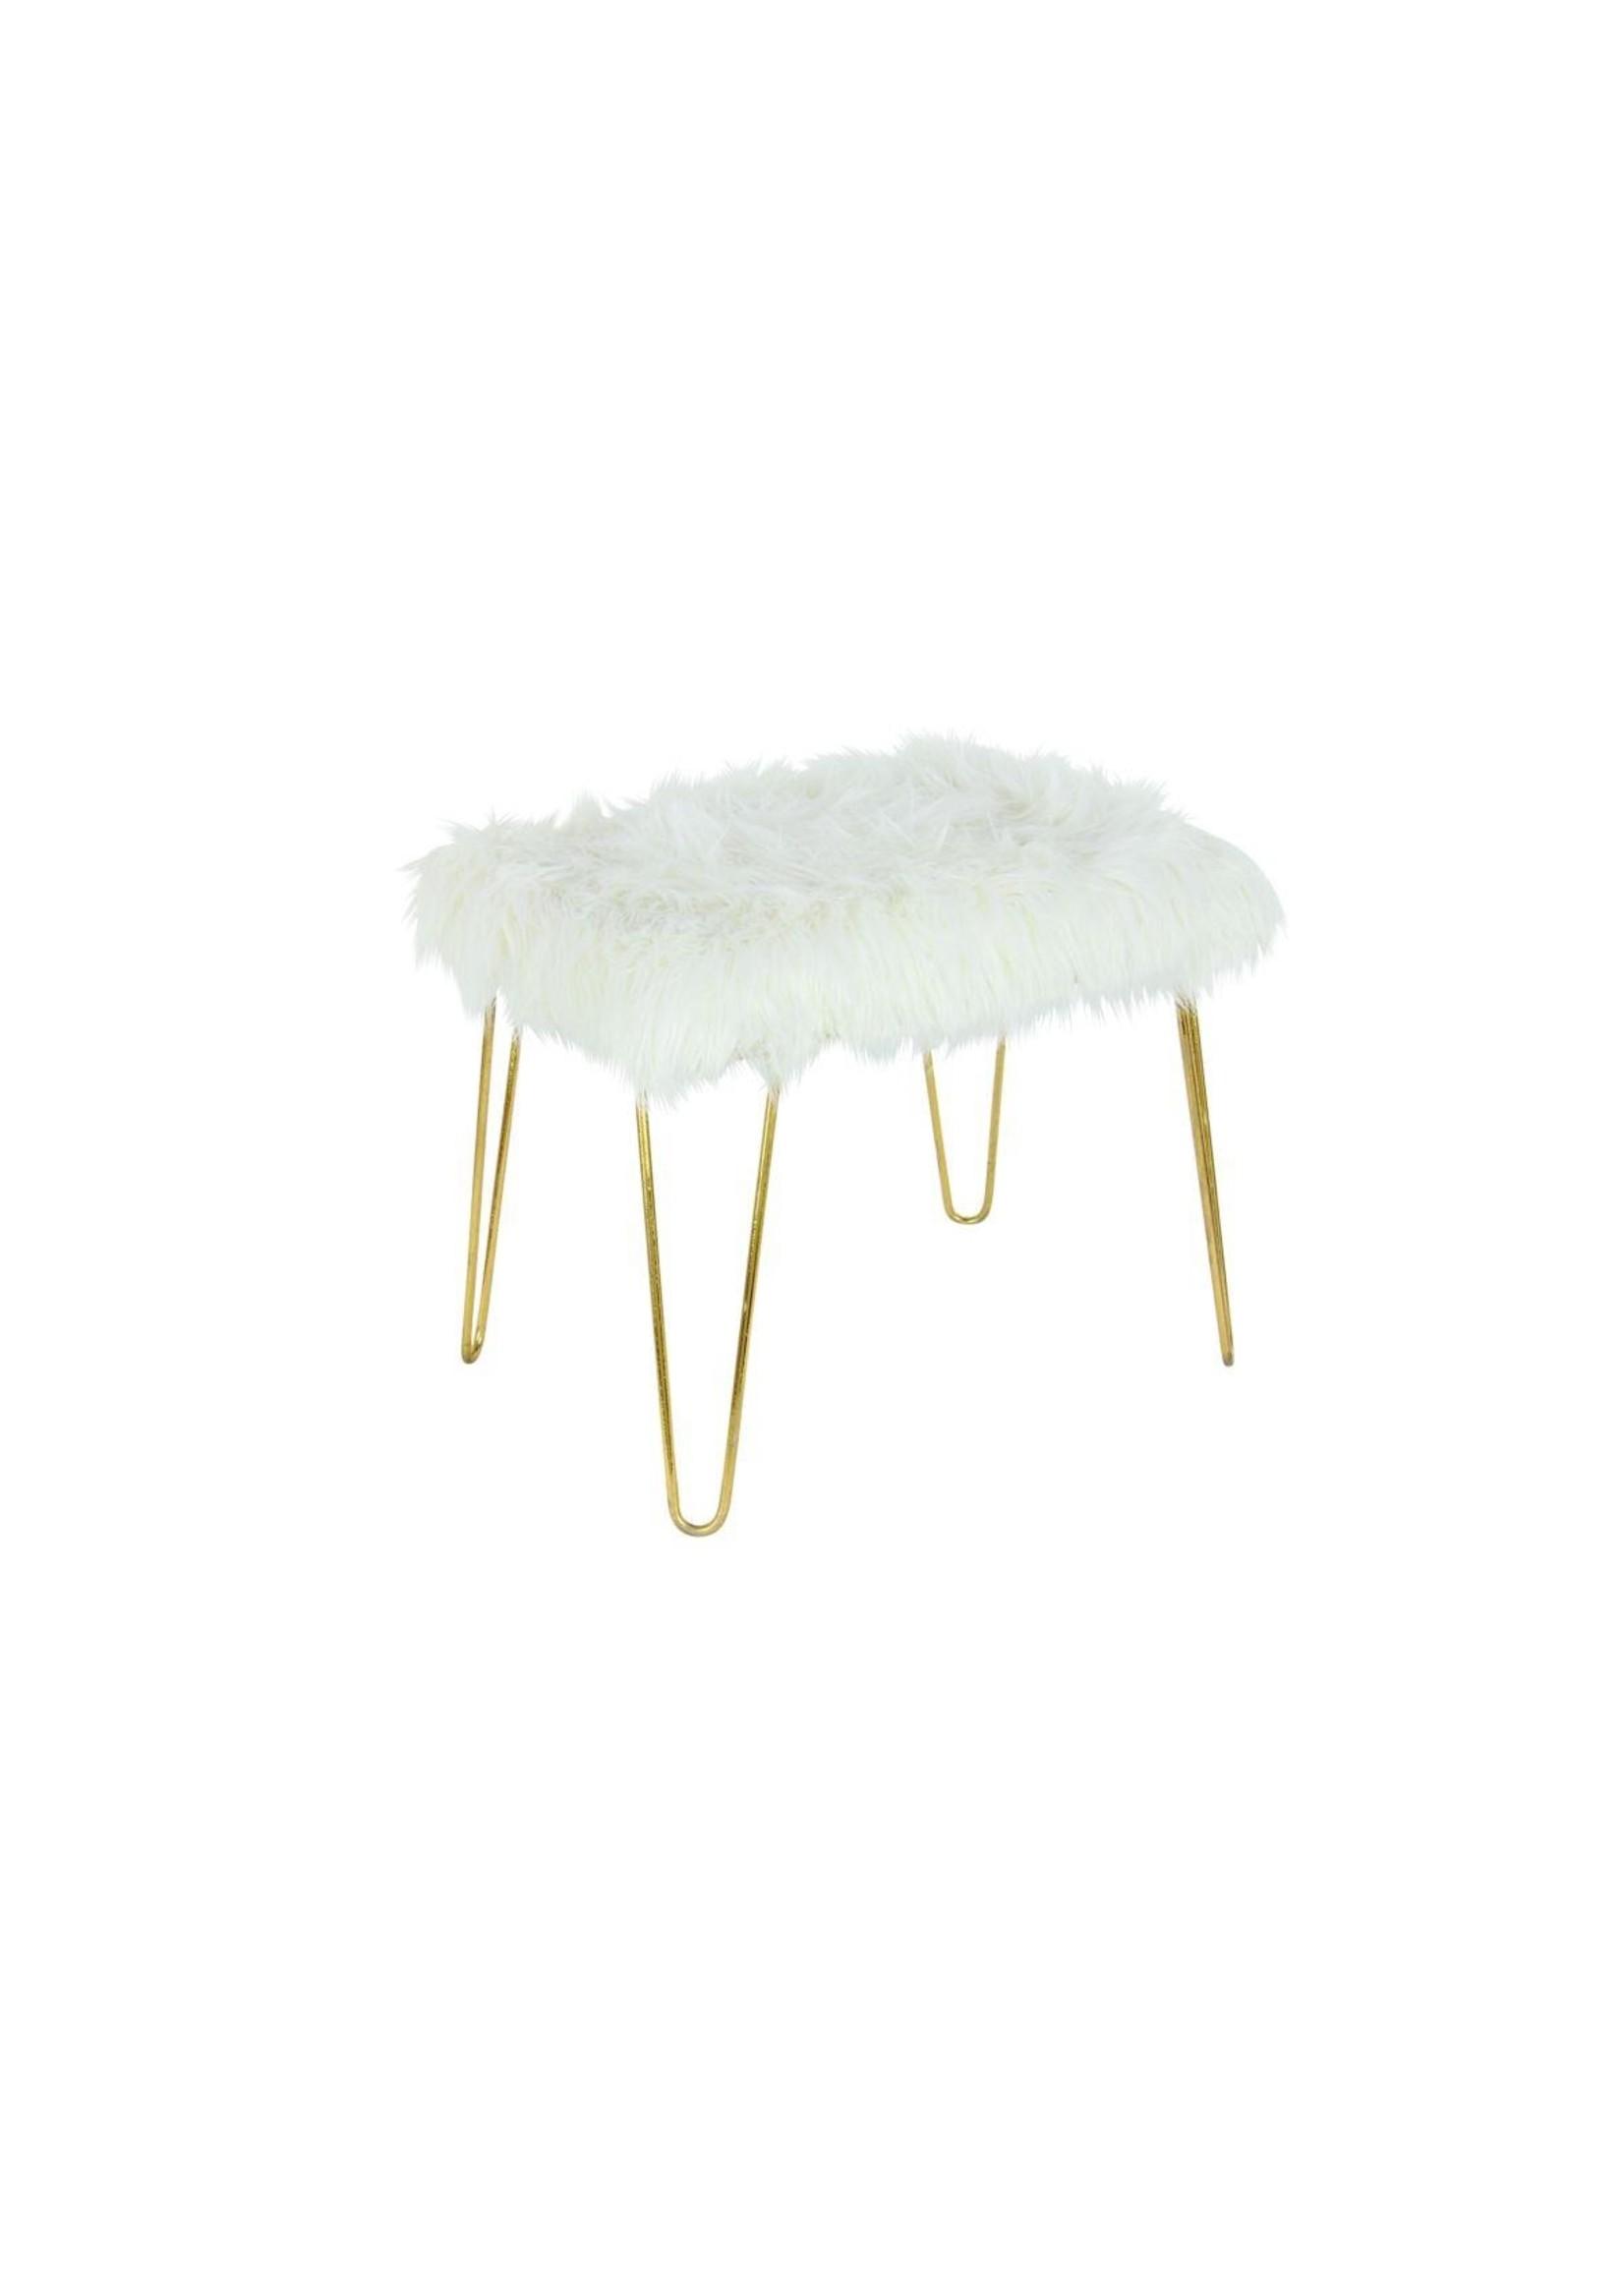 UMA Enterprises UMA White Faux Fur Gold Leg Stool